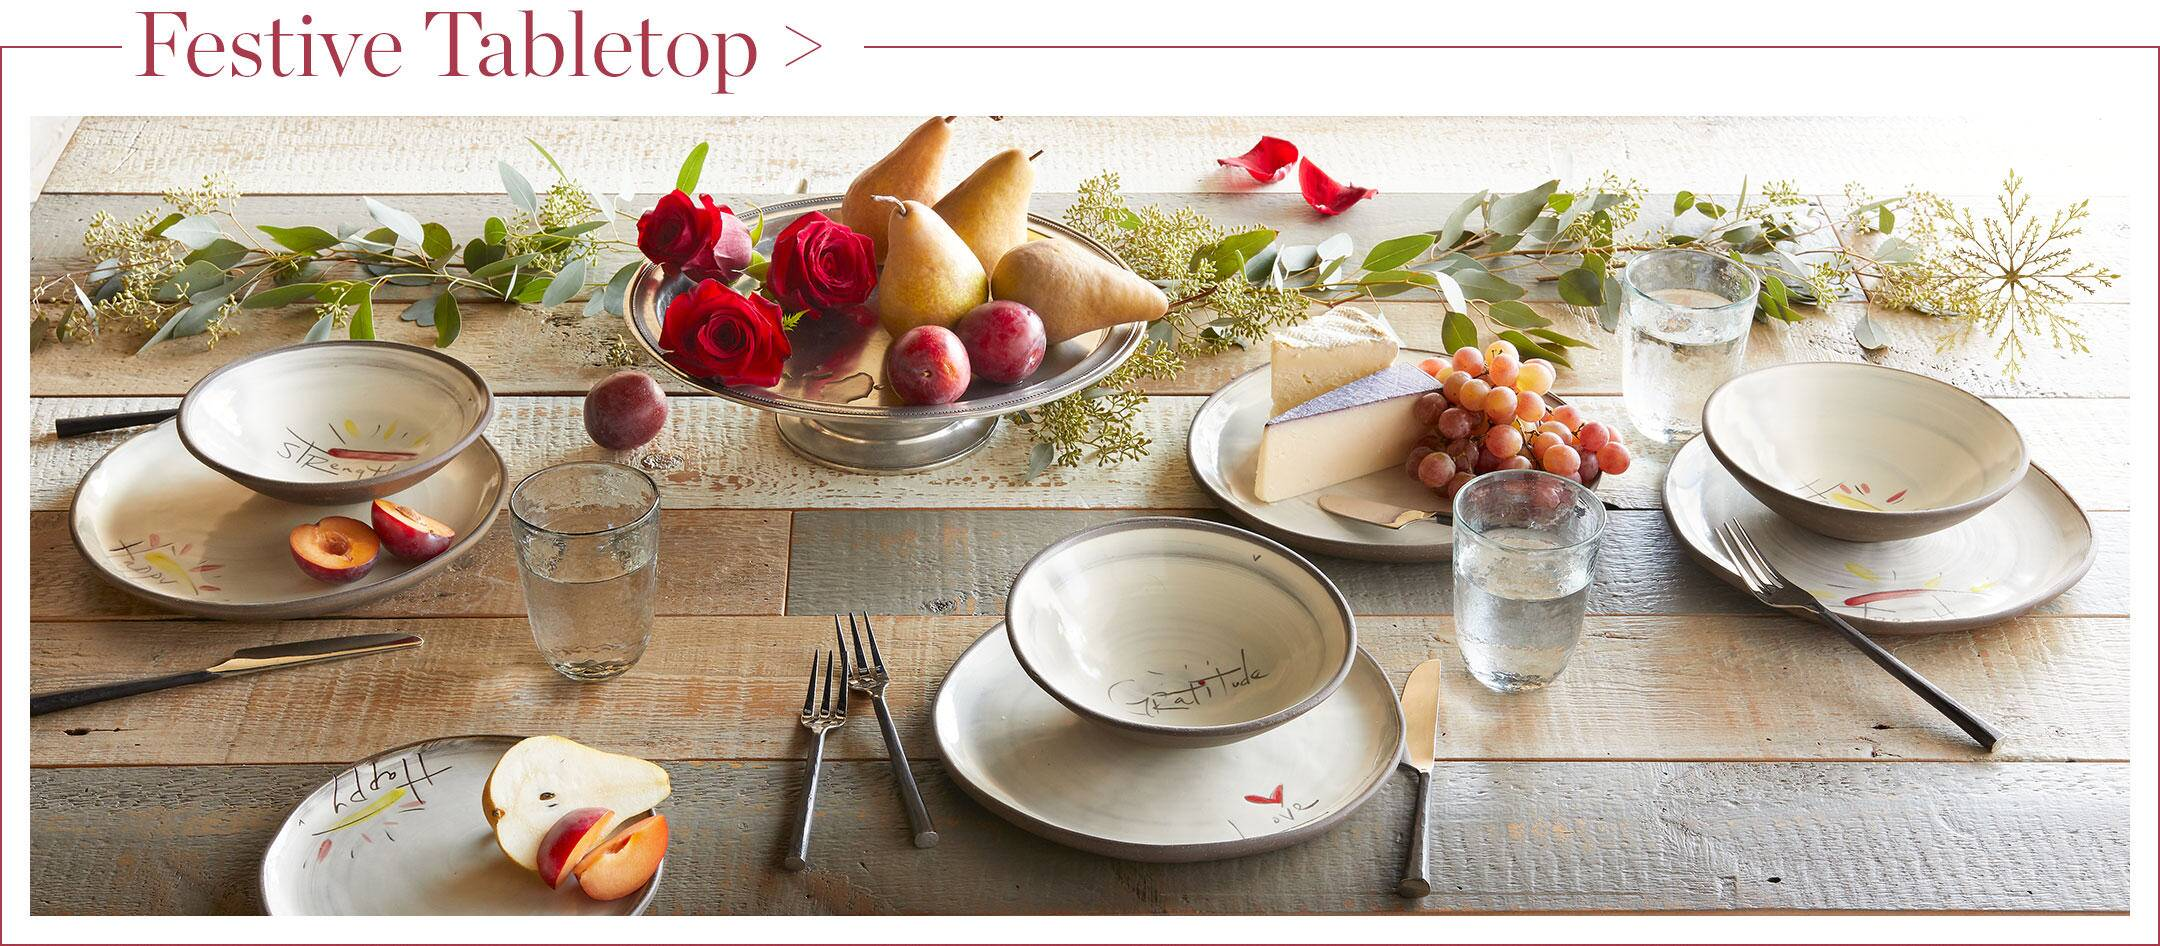 Festive Tabletop